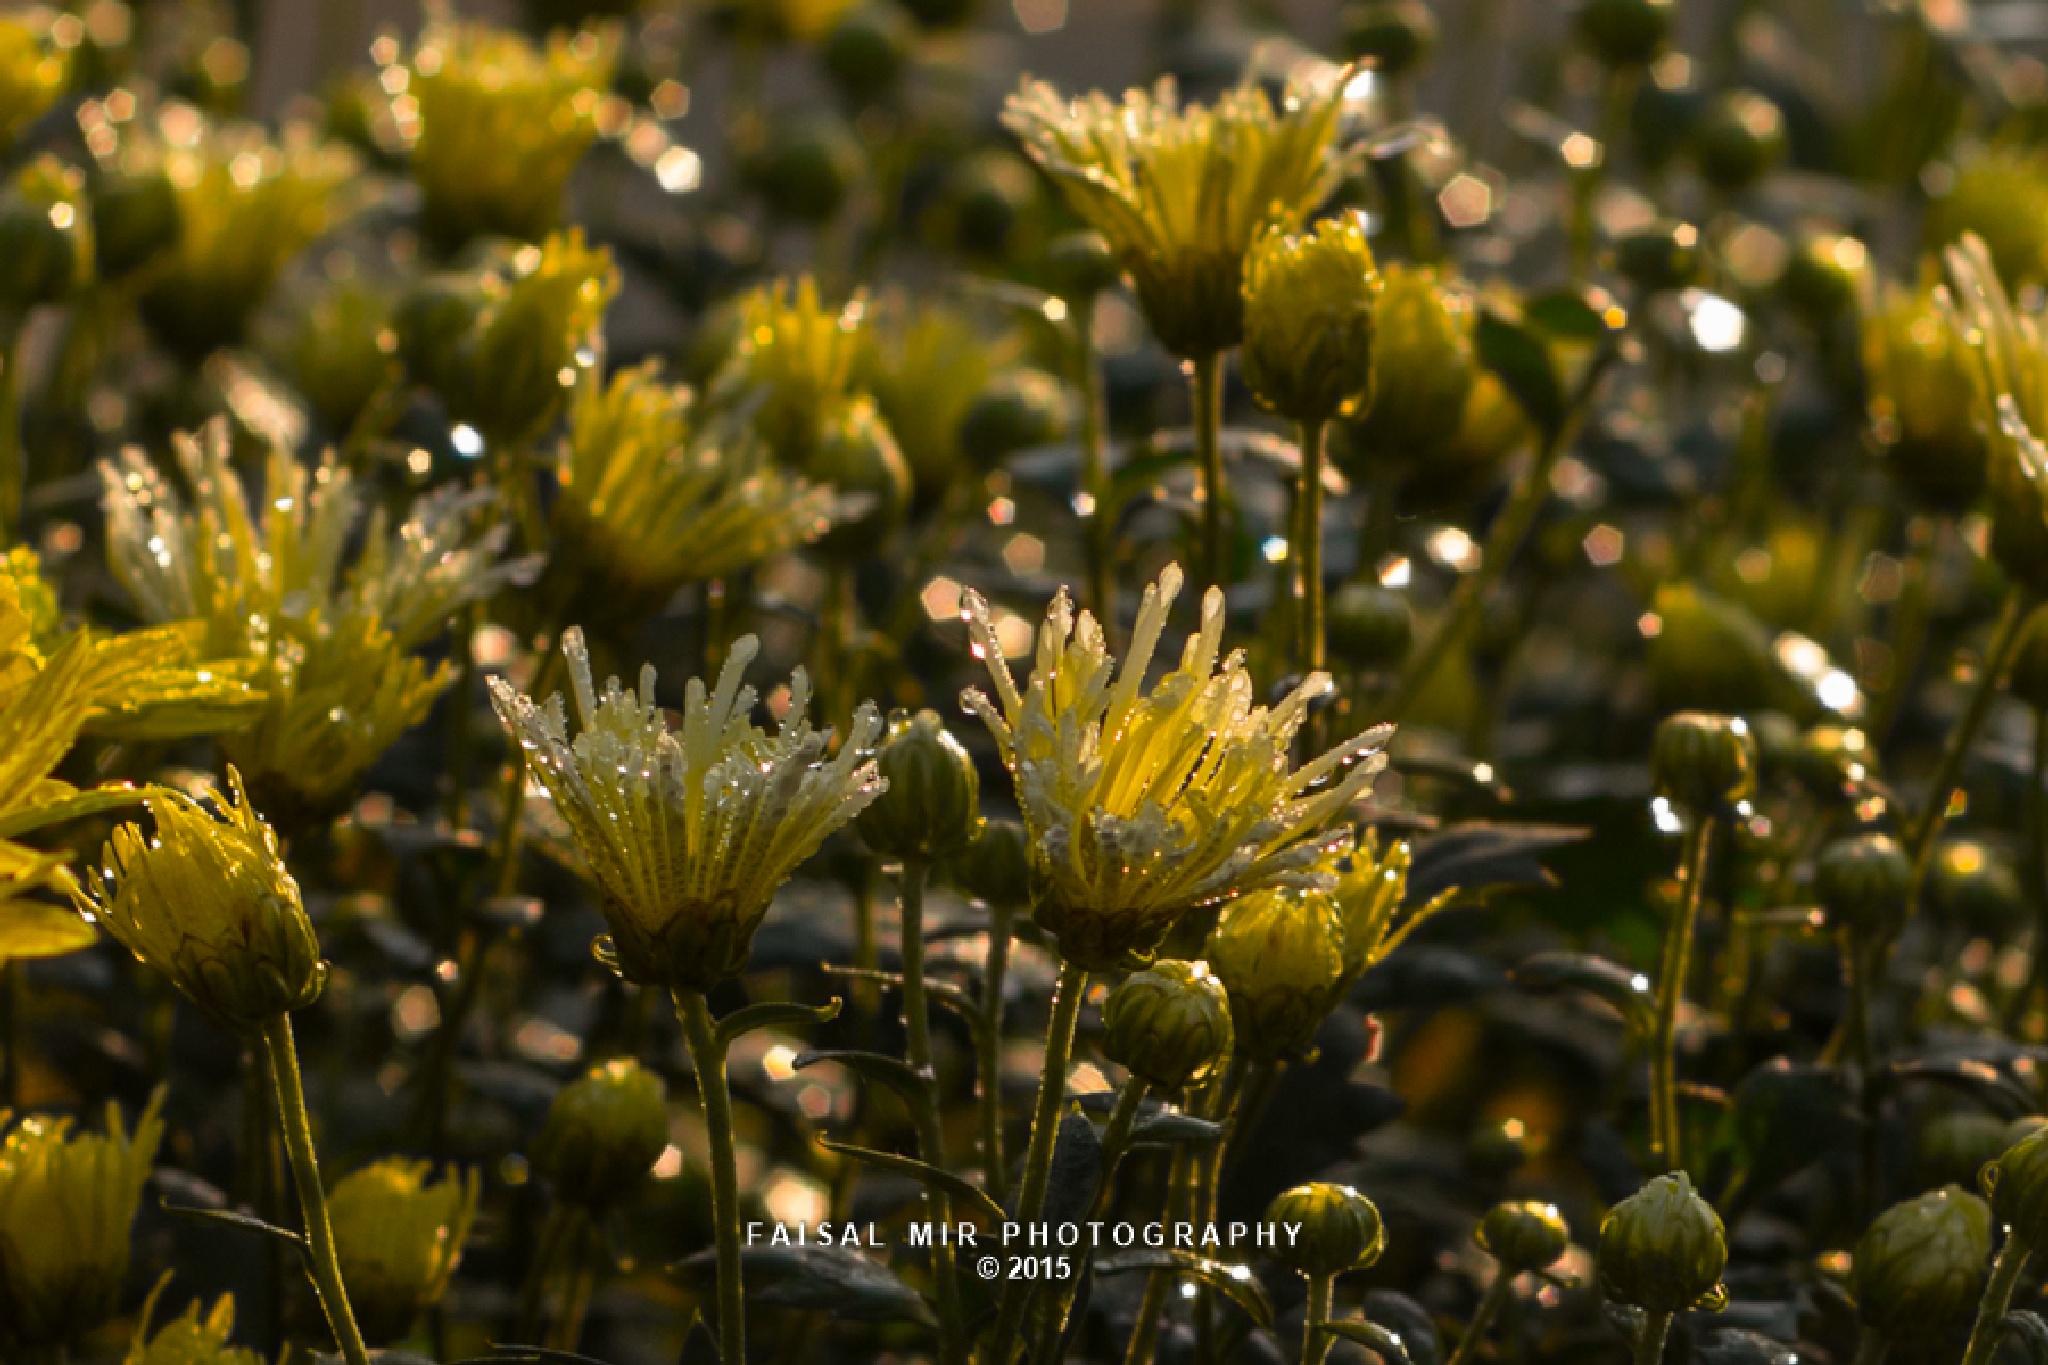 Chrysanthemum Flower Show 2015 by MirFaisal